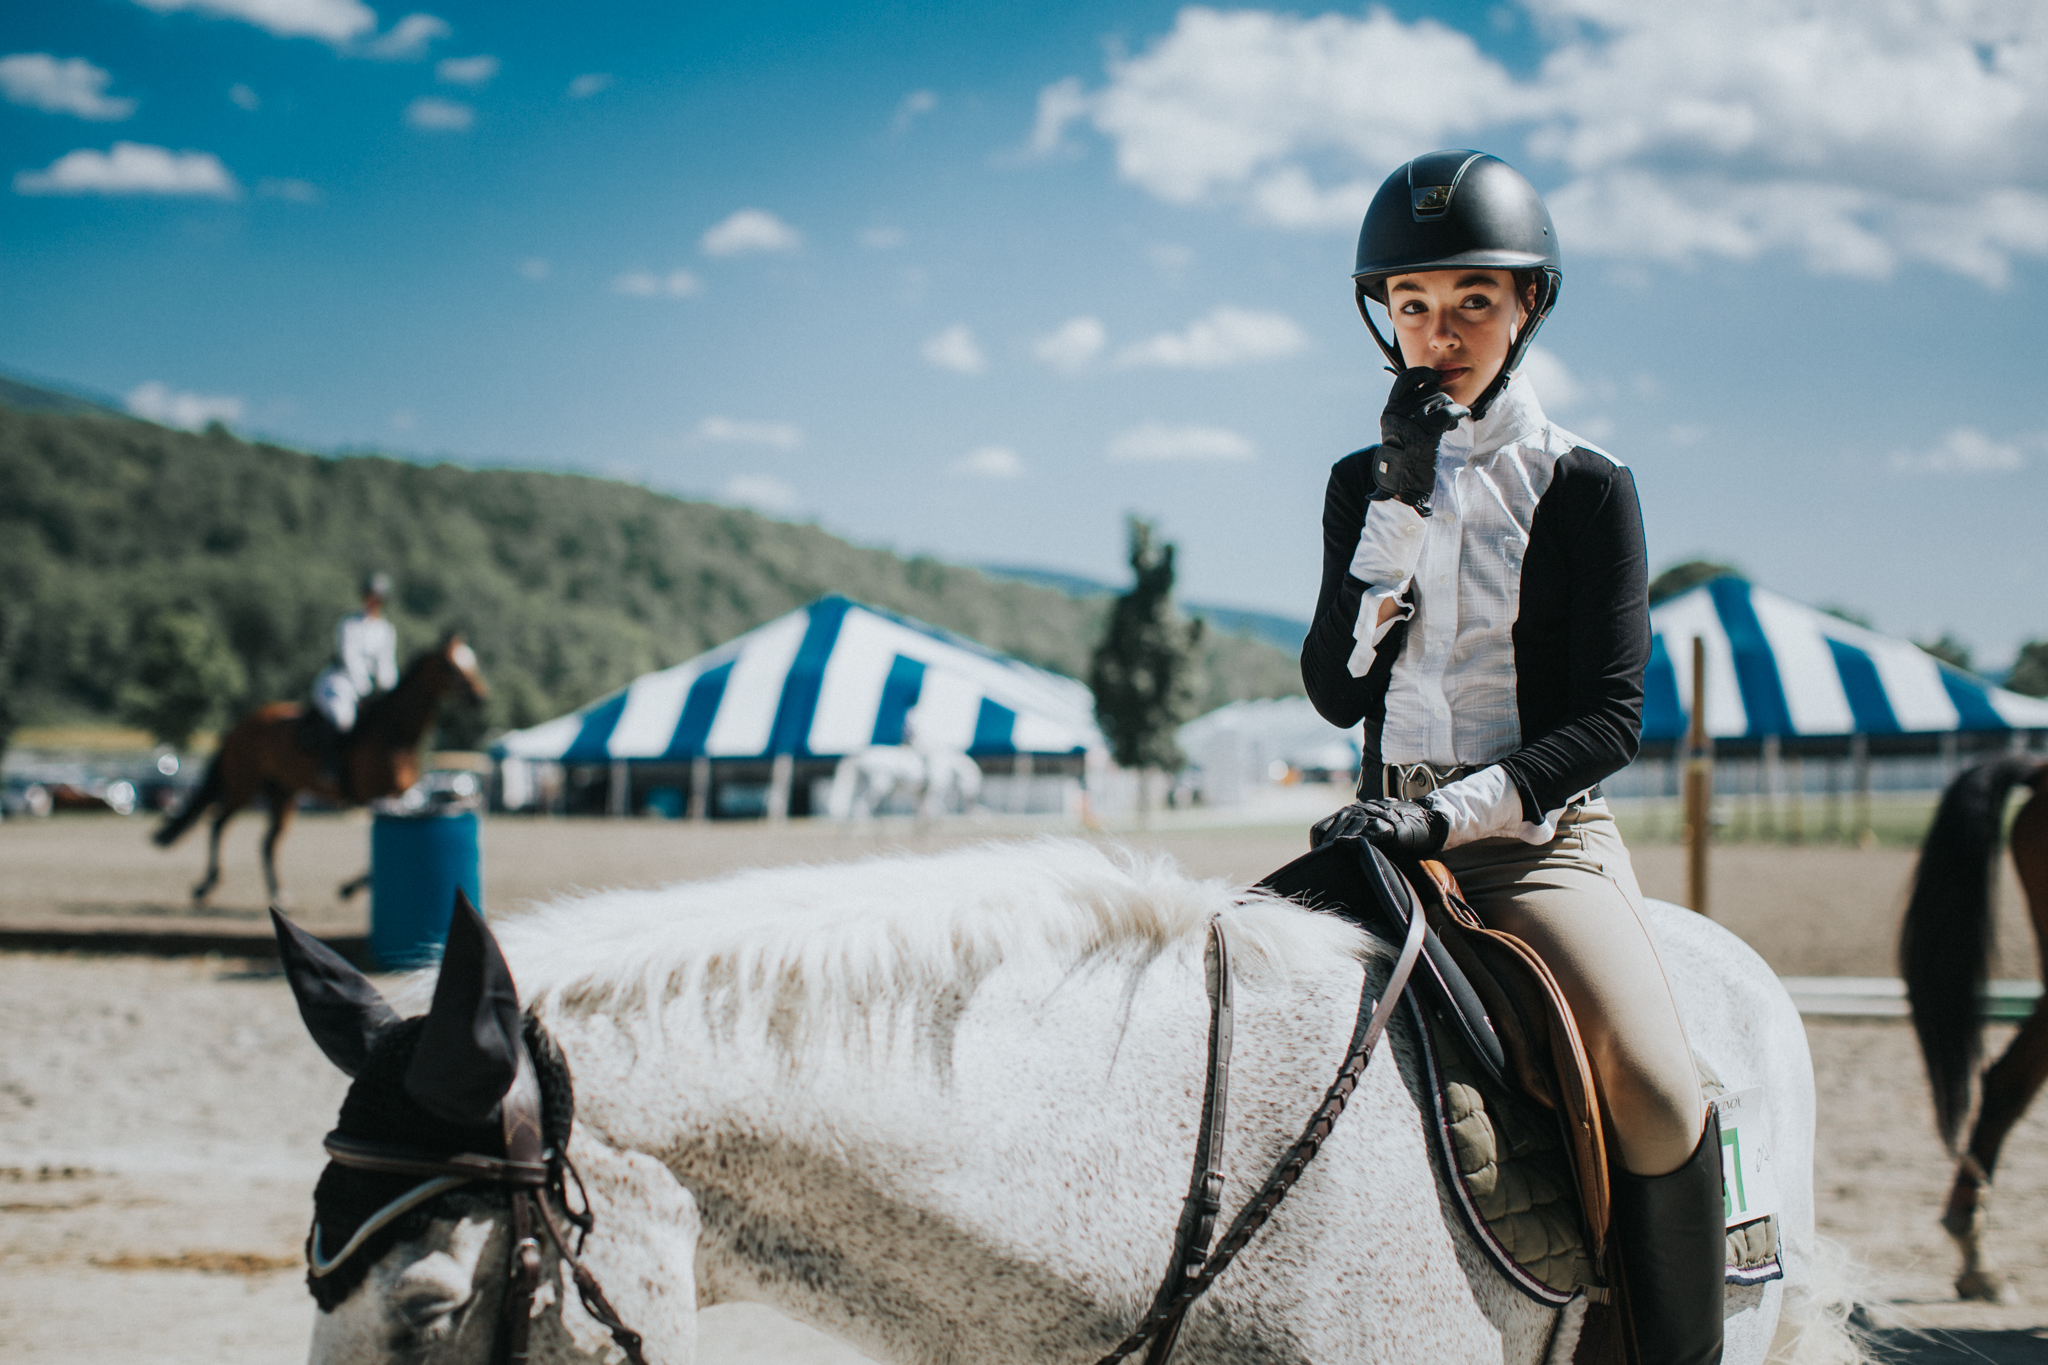 Horseback girl, Personal project